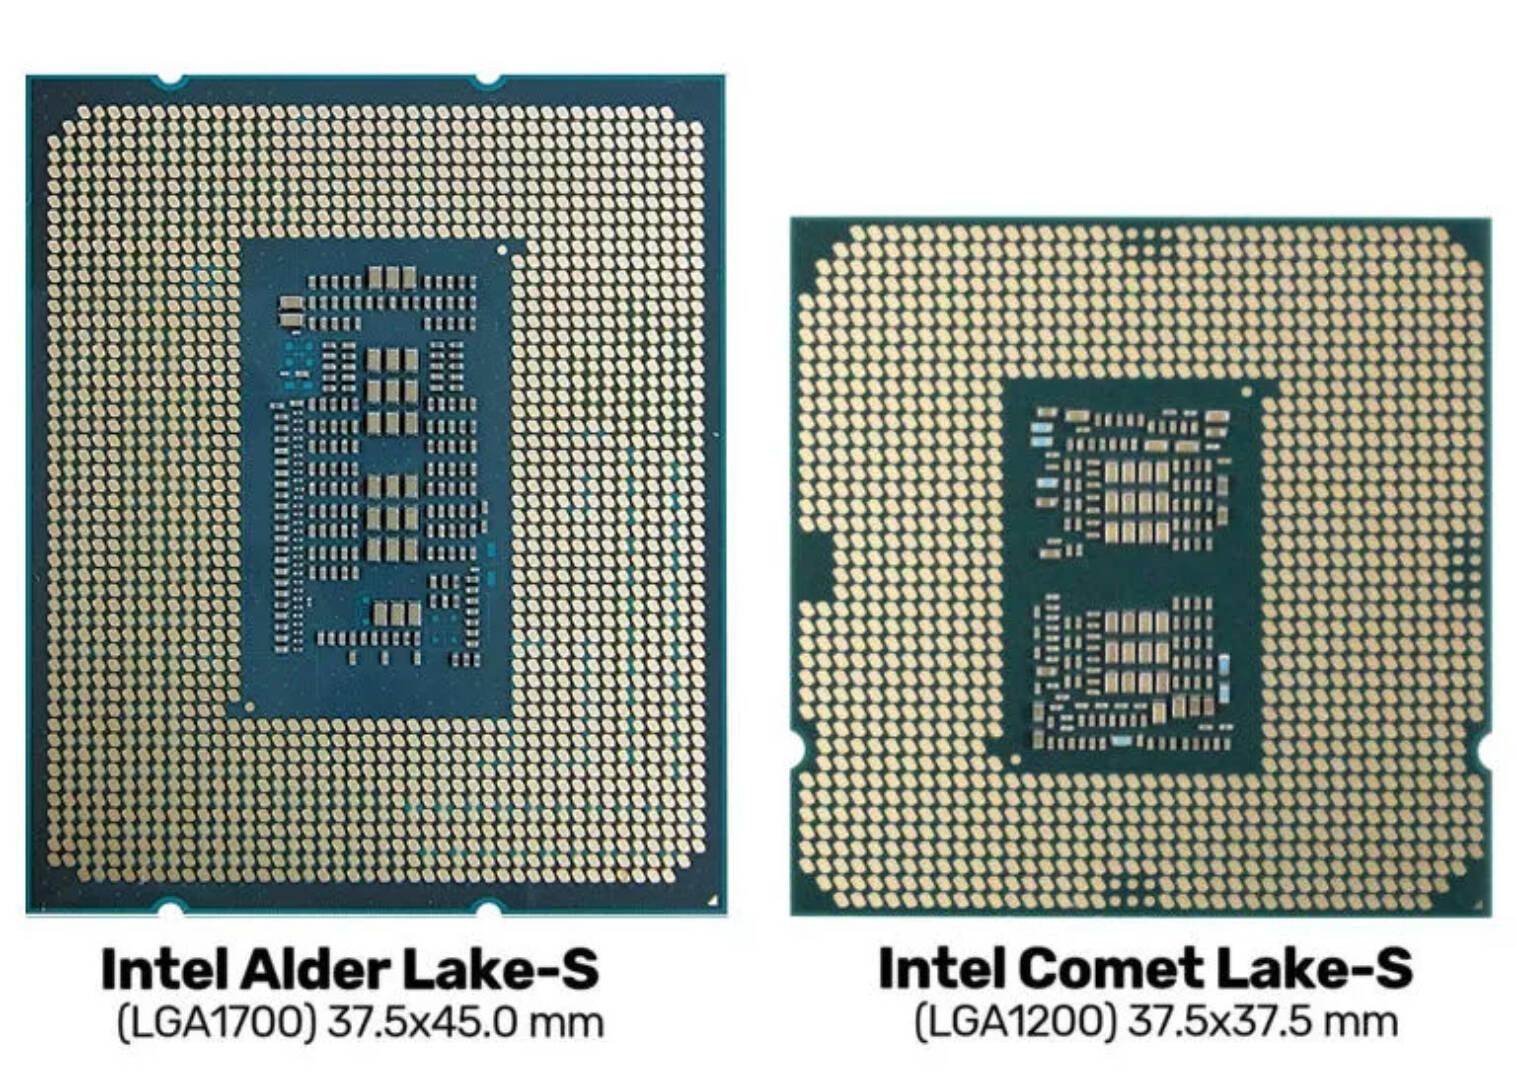 Socker LGA 1700 Intel Alder Lake